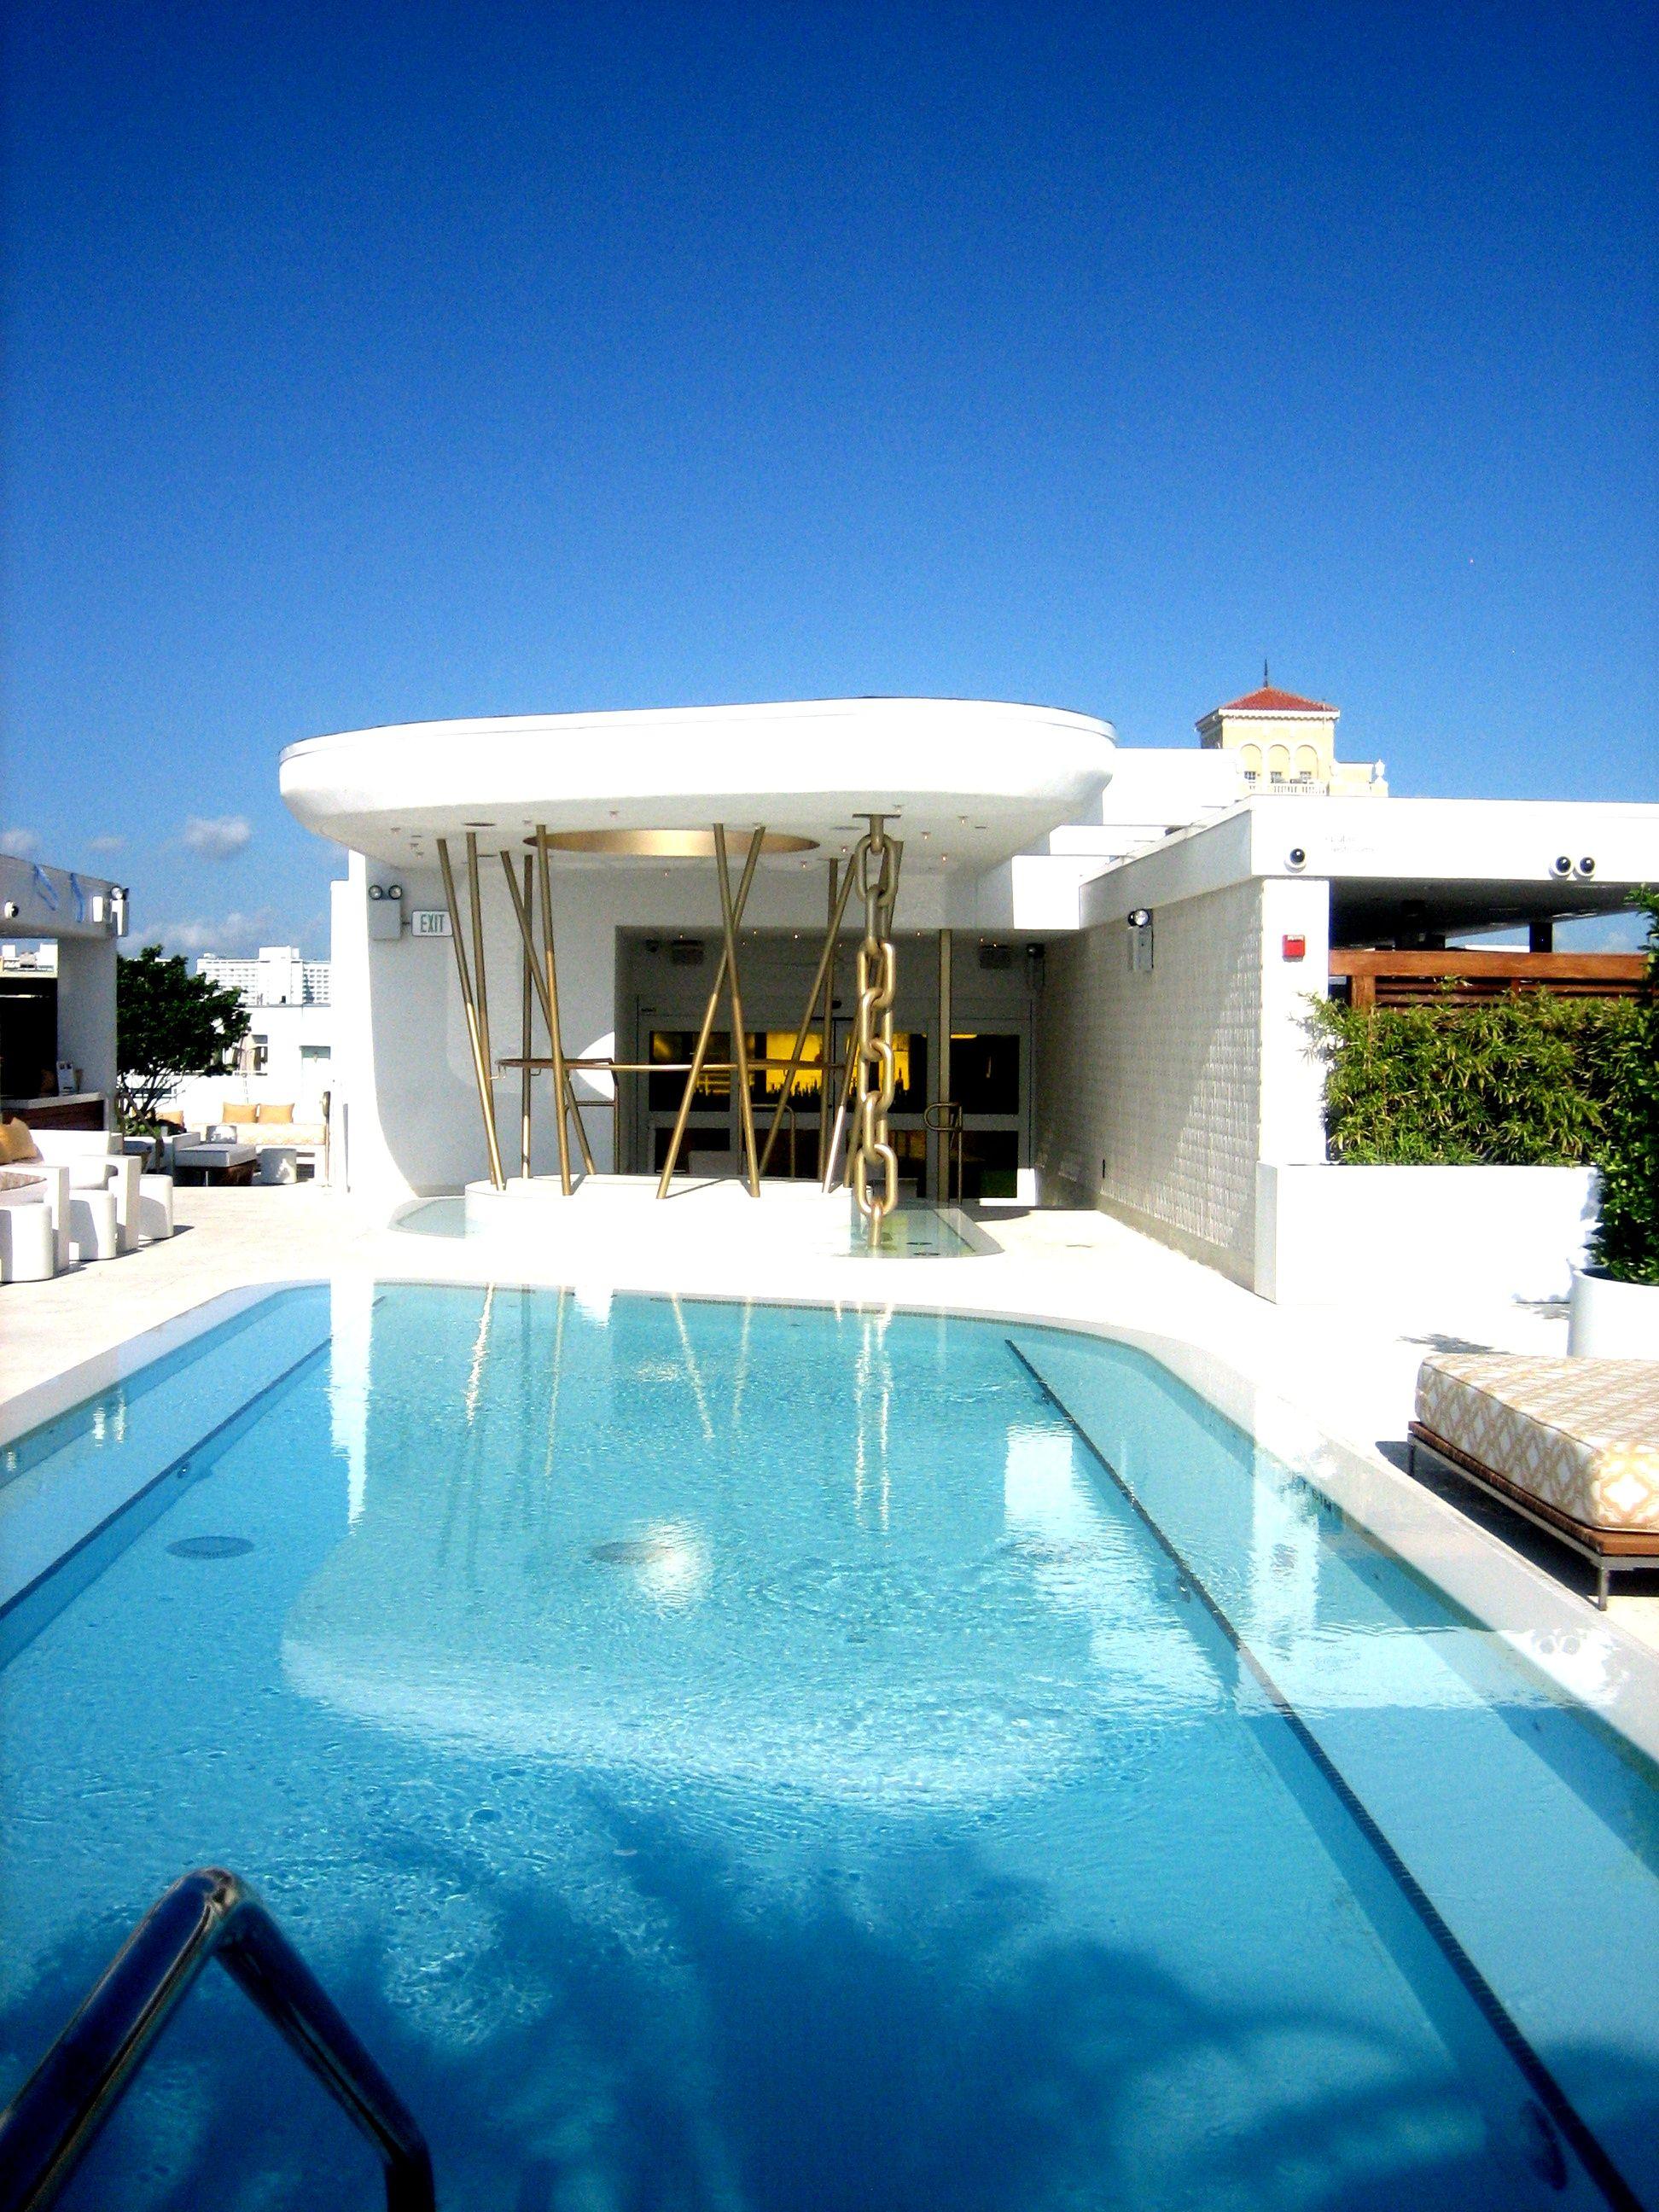 Dream Hotel Rooftop Pool Deck Miami Beach Mutibokocouk Wp